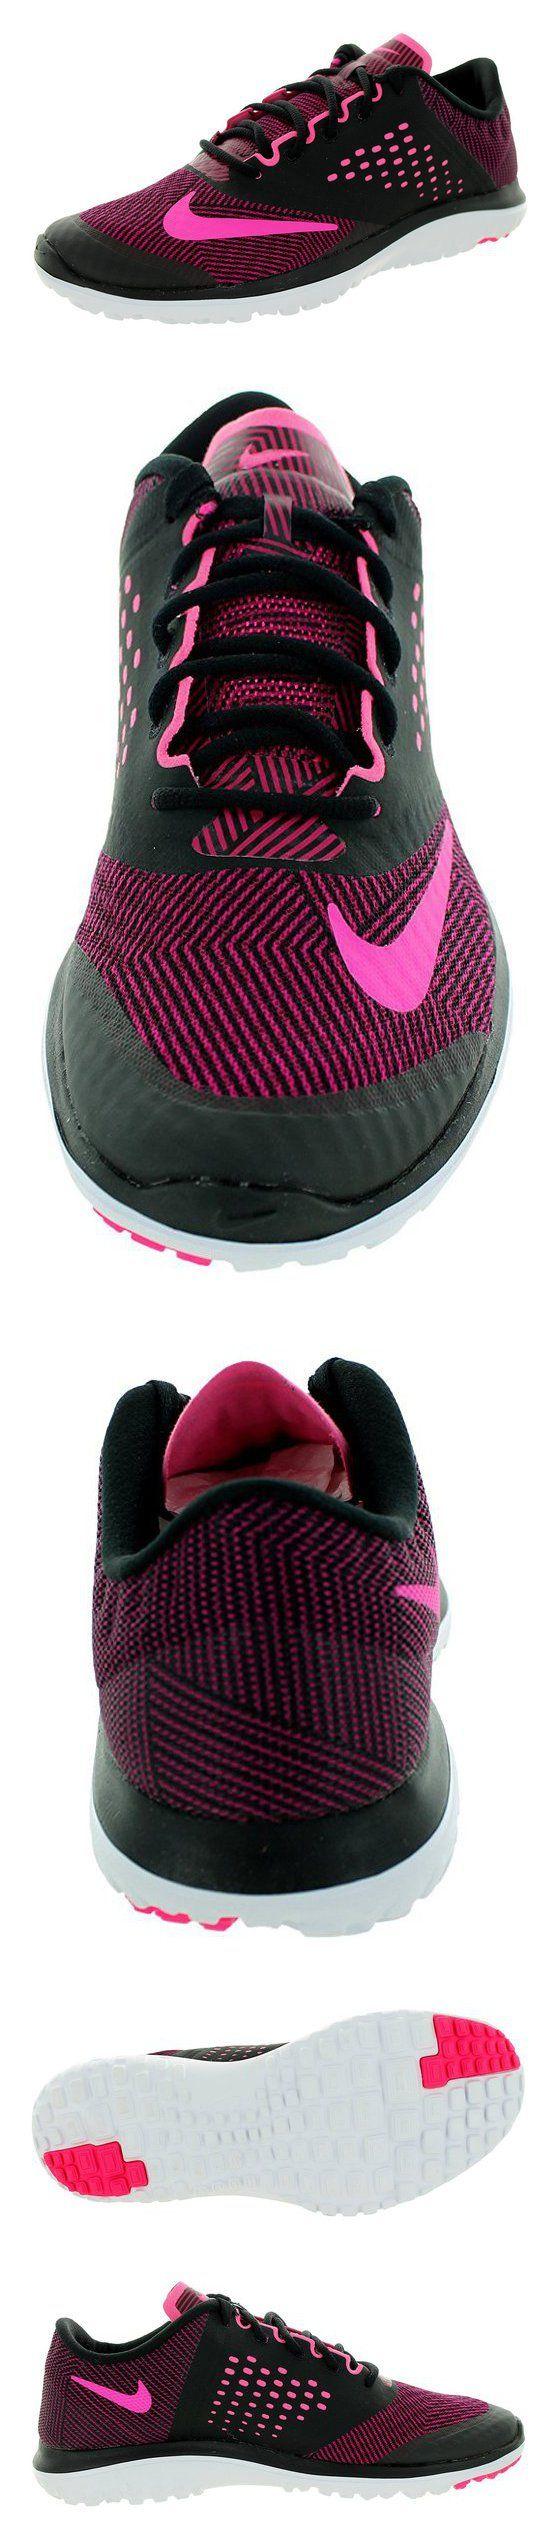 $80 - Nike Women's Fs Lite Run 2 Prem Black/Pink Pow/Sprt Fchs/White Running Shoe 9 Women US #shoes #nike